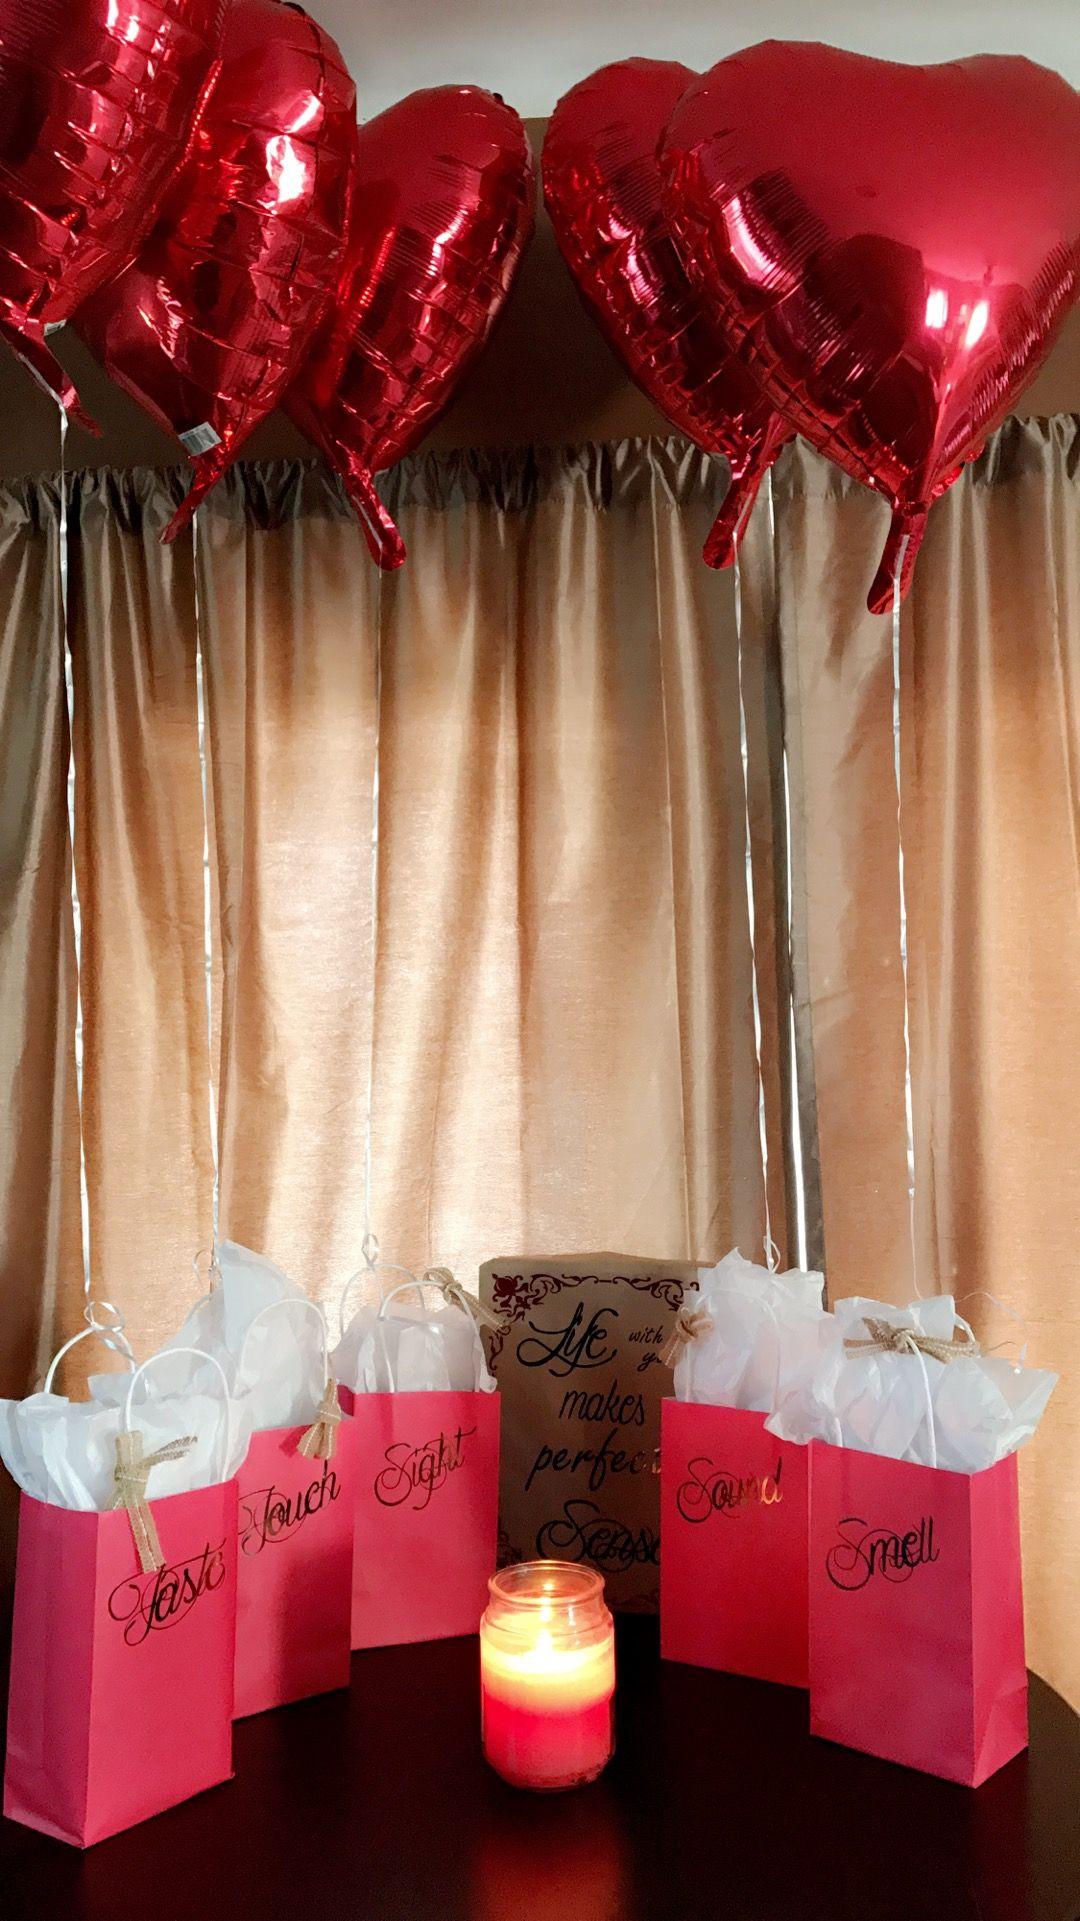 5 Senses Gift Decals Https Www Etsy Com Shop Classycreationsmds Ref S2 Header Sh Anniversary Gifts Boyfriend Anniversary Gifts Valentines Day Gifts For Him